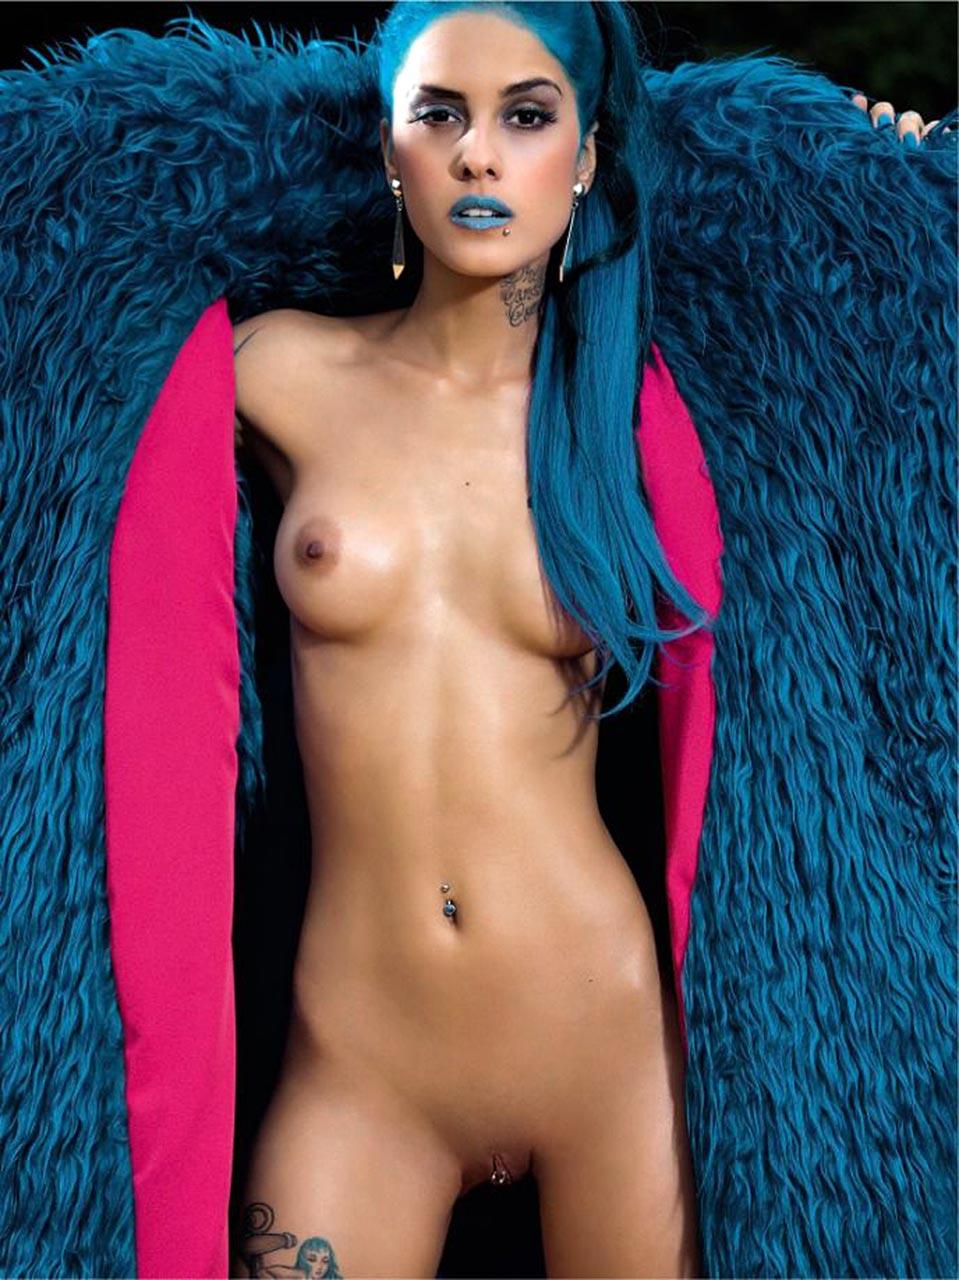 Topless Tati Zaqui nudes (23 photos), Tits, Cleavage, Selfie, see through 2018